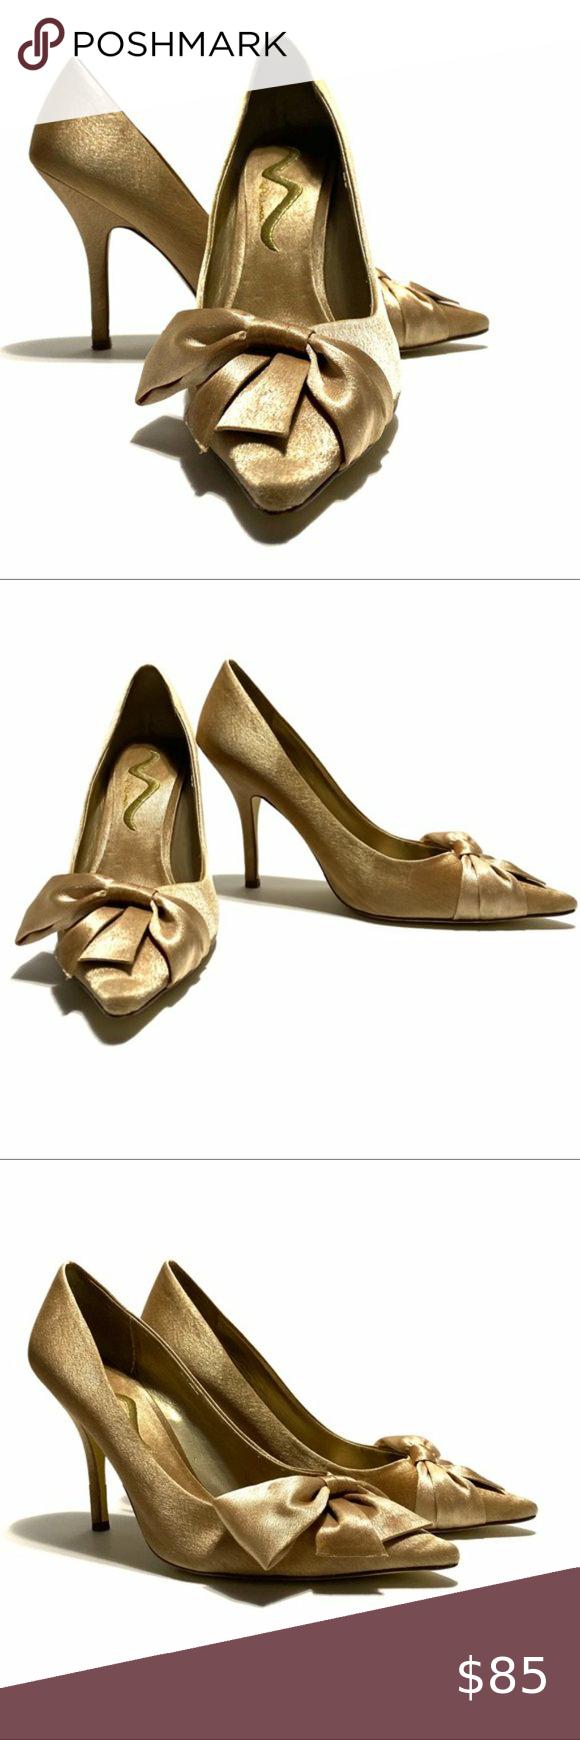 Nina Gold Royal Satin Bow Pointed Toe High Heels Shoes Women Heels Sparkly High Heels Heels